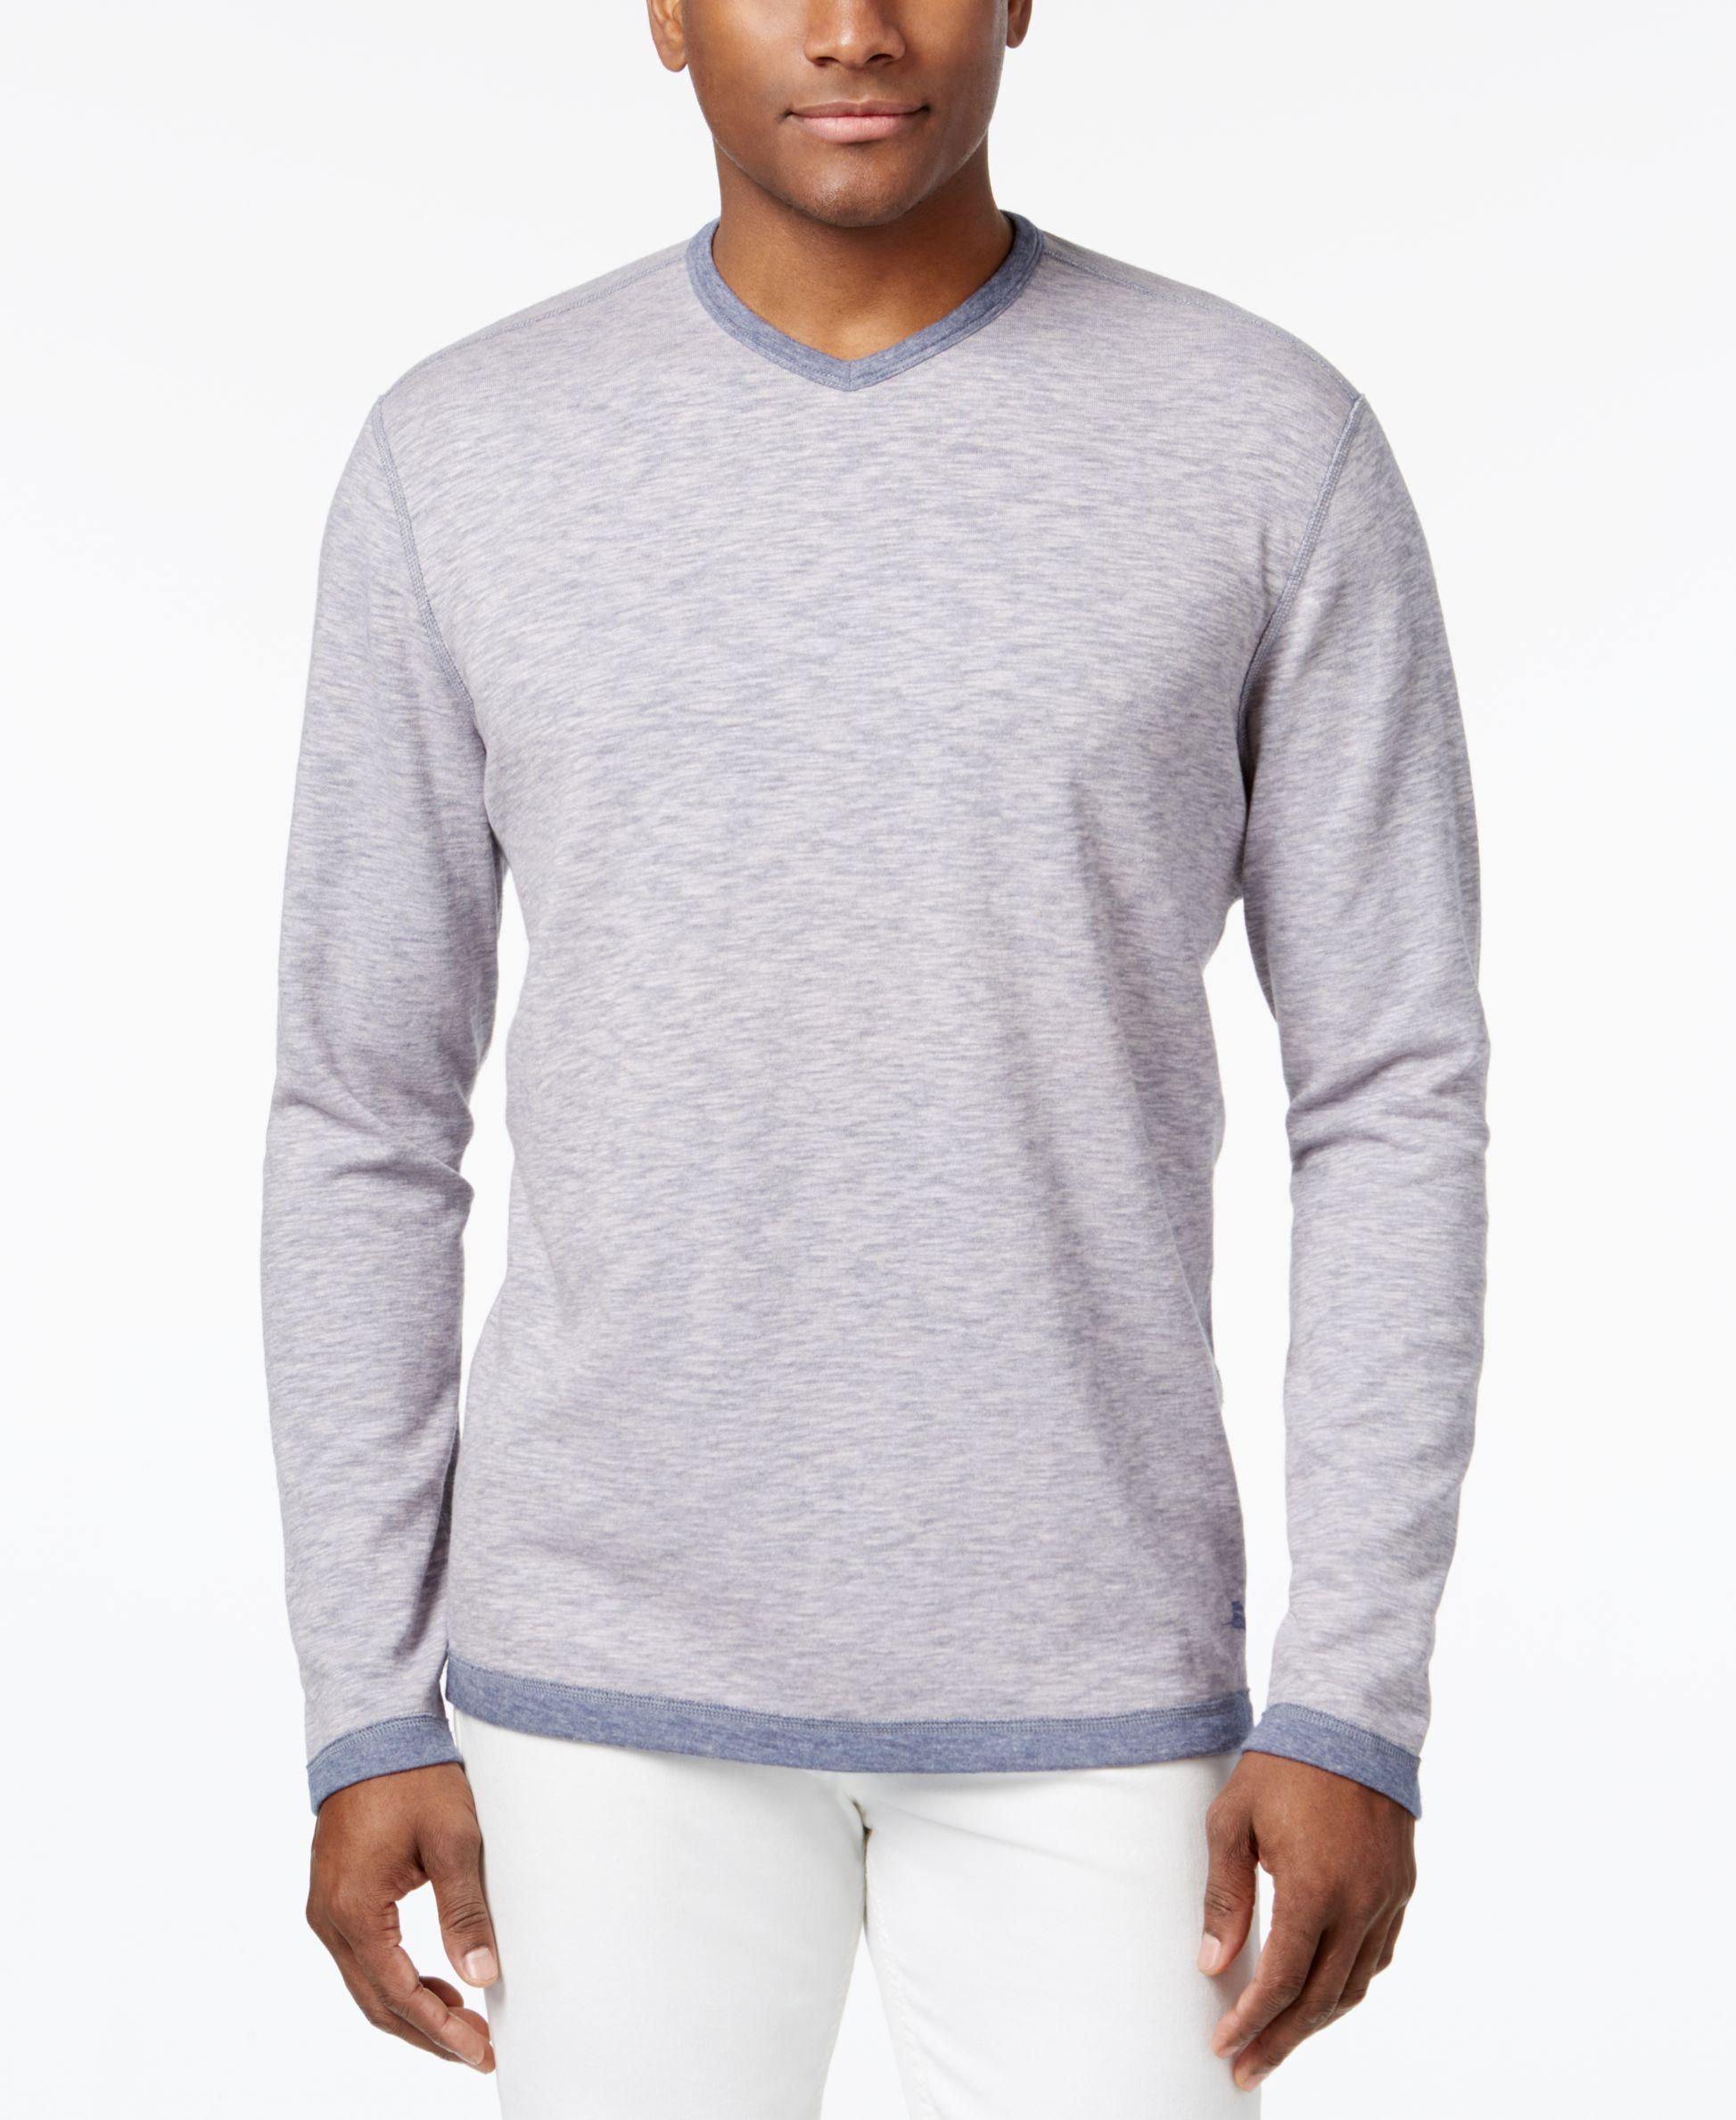 Tommy Bahama Men S Big Tall Sea Glass Reversible Sweatshirt Mens Big And Tall Tommy Bahama Mens Long Sleeve Tshirt Men [ 2378 x 1947 Pixel ]